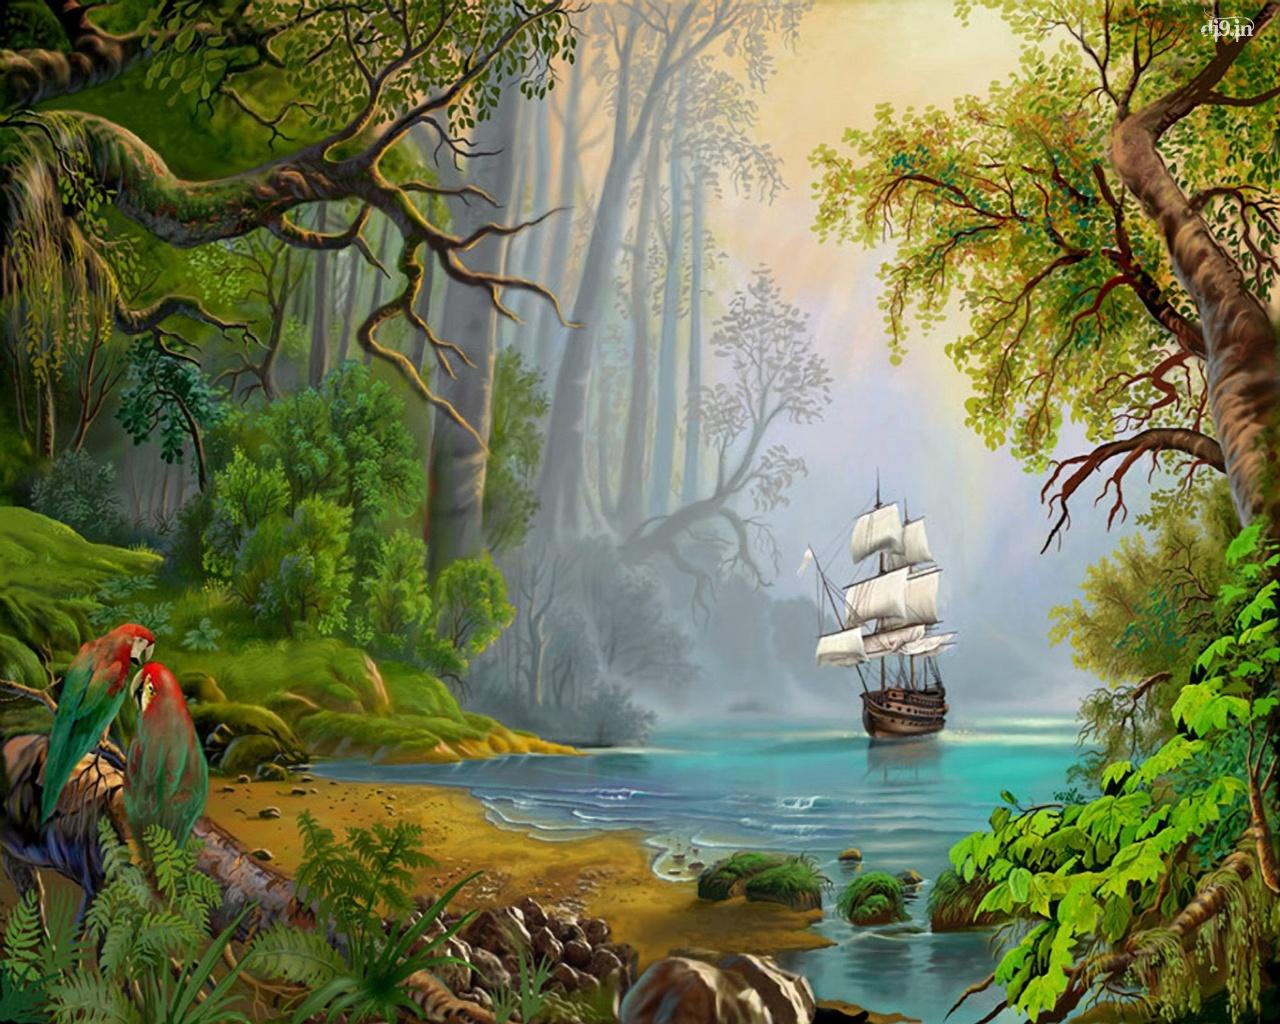 Latest Hd Nature Wallpapers Nature Art Wallpaper Hd 1280x1024 Wallpaper Teahub Io